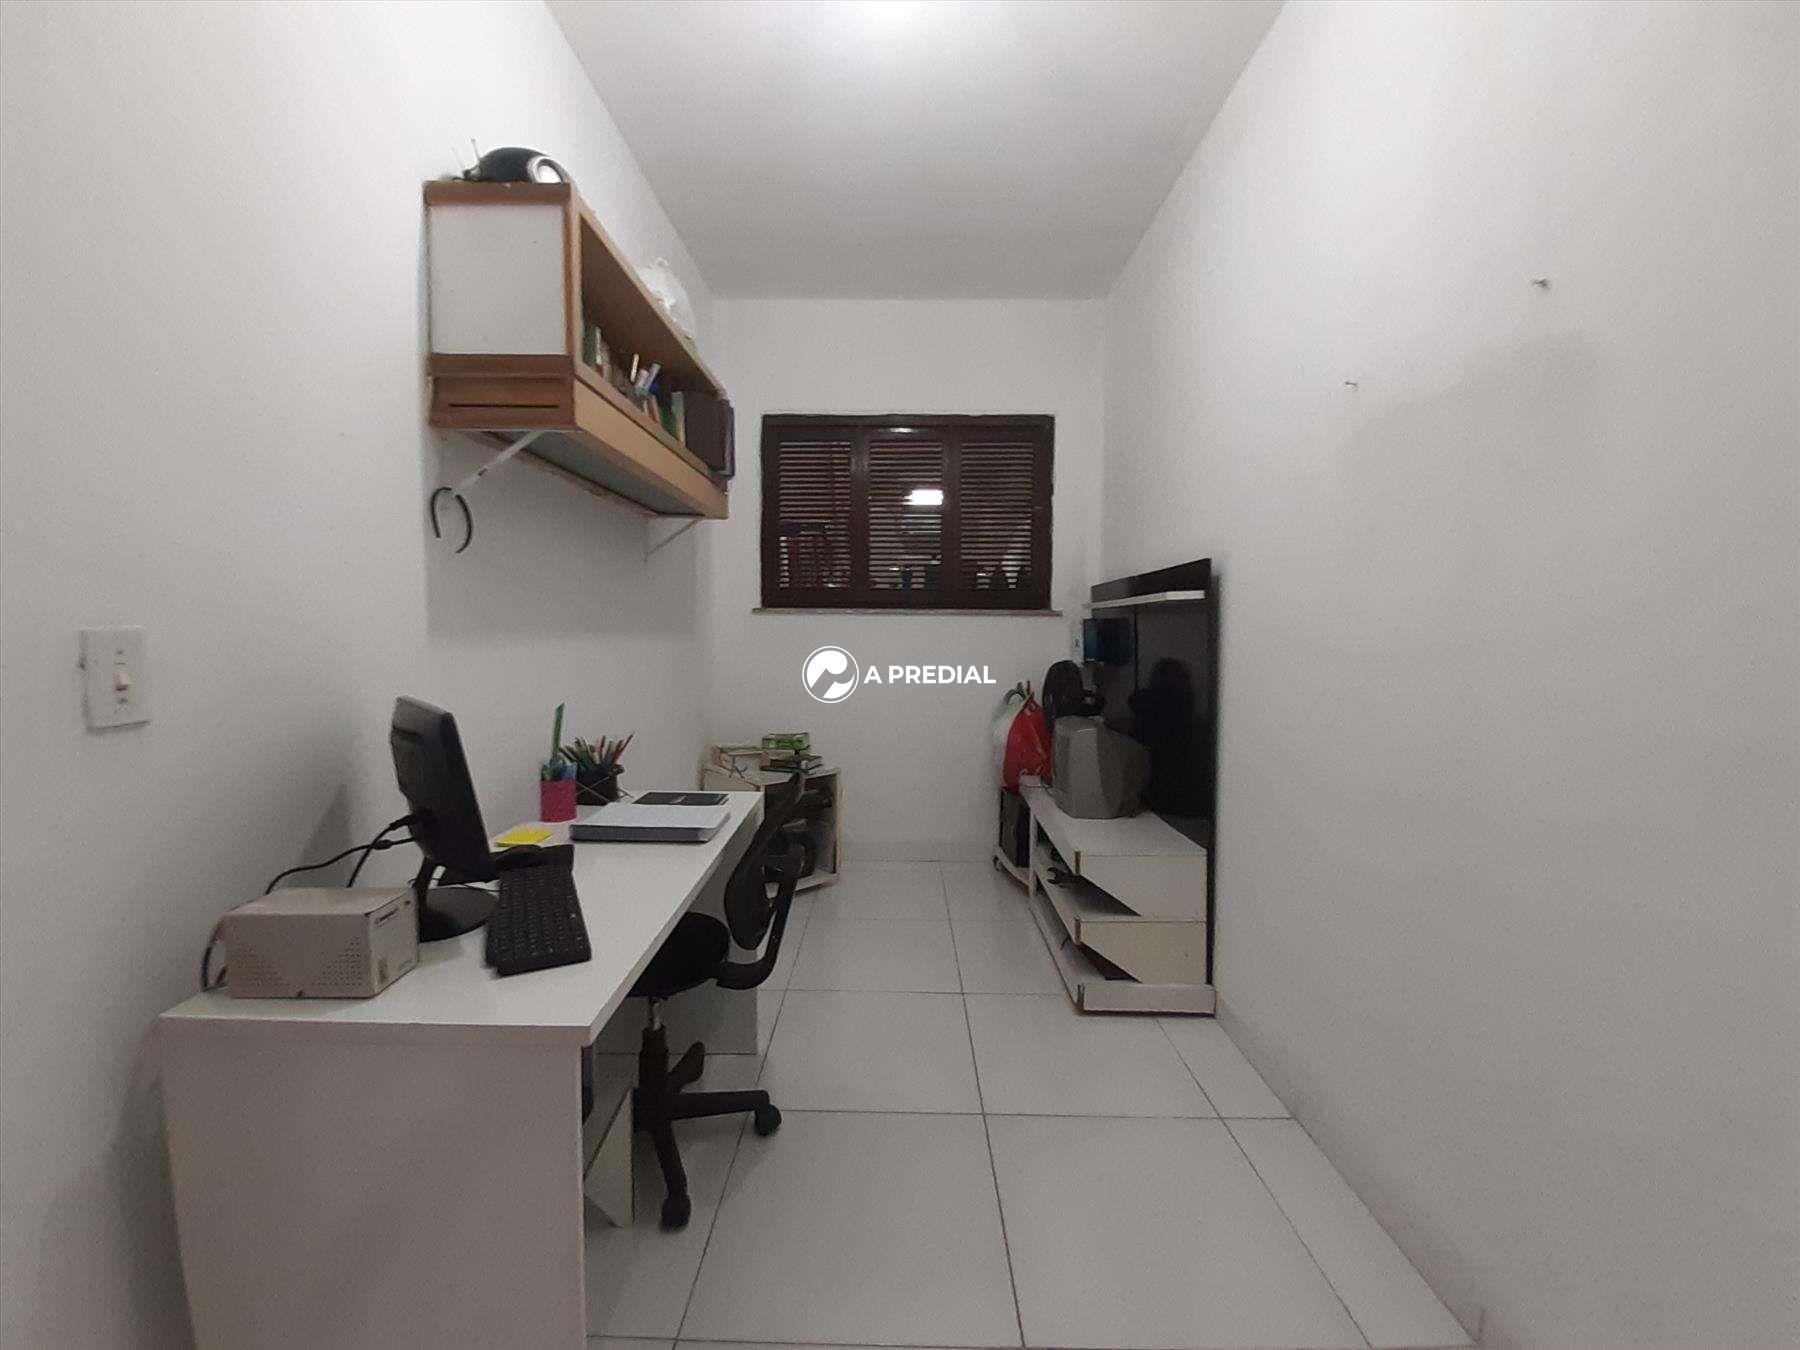 Casa à venda no Prefeito José Walter: a41f374b-0-20200718_121401.jpg